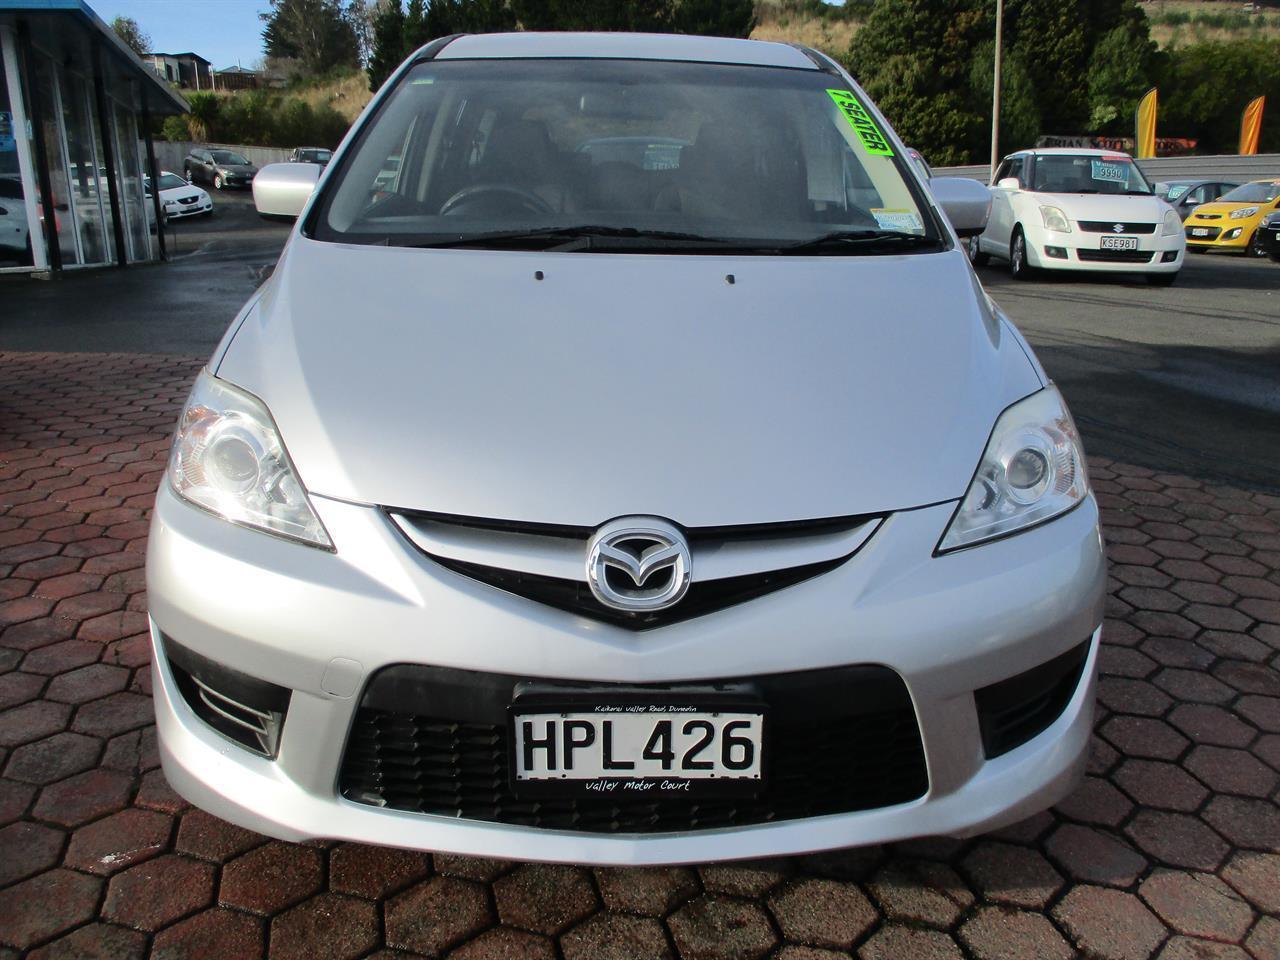 image-8, 2010 Mazda Premacy Seven Seater at Dunedin